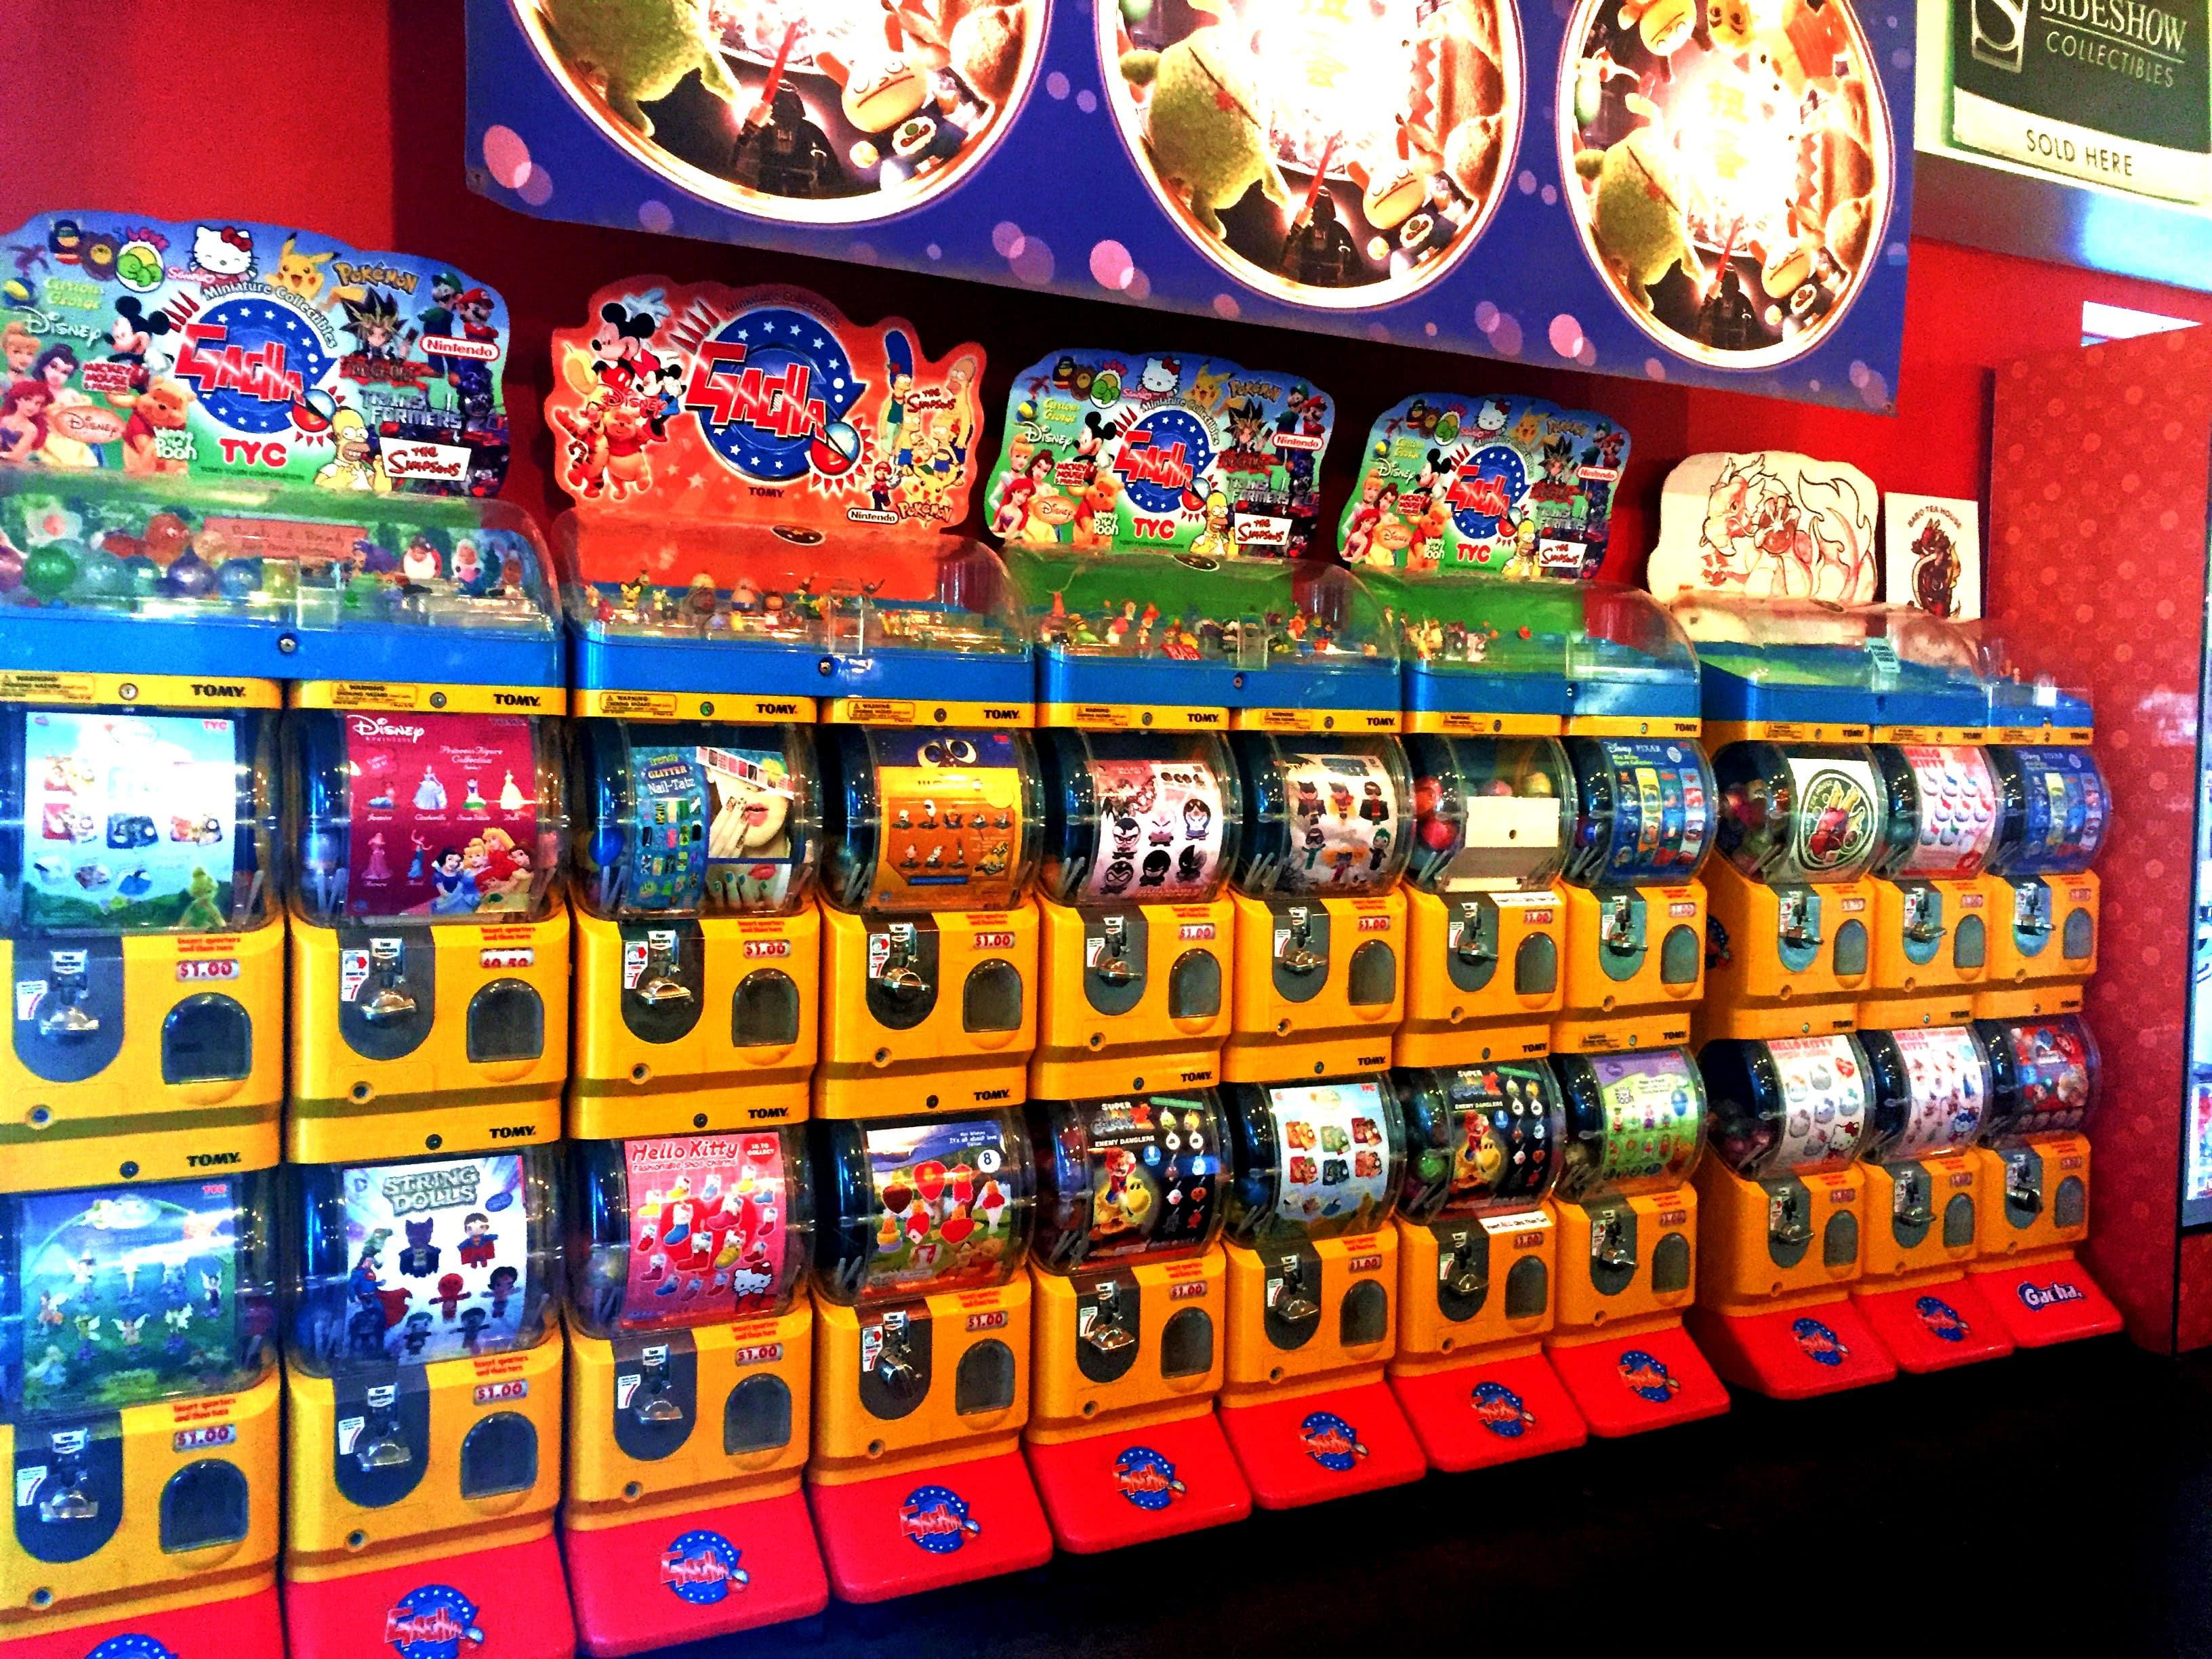 vending machine toys in Japan